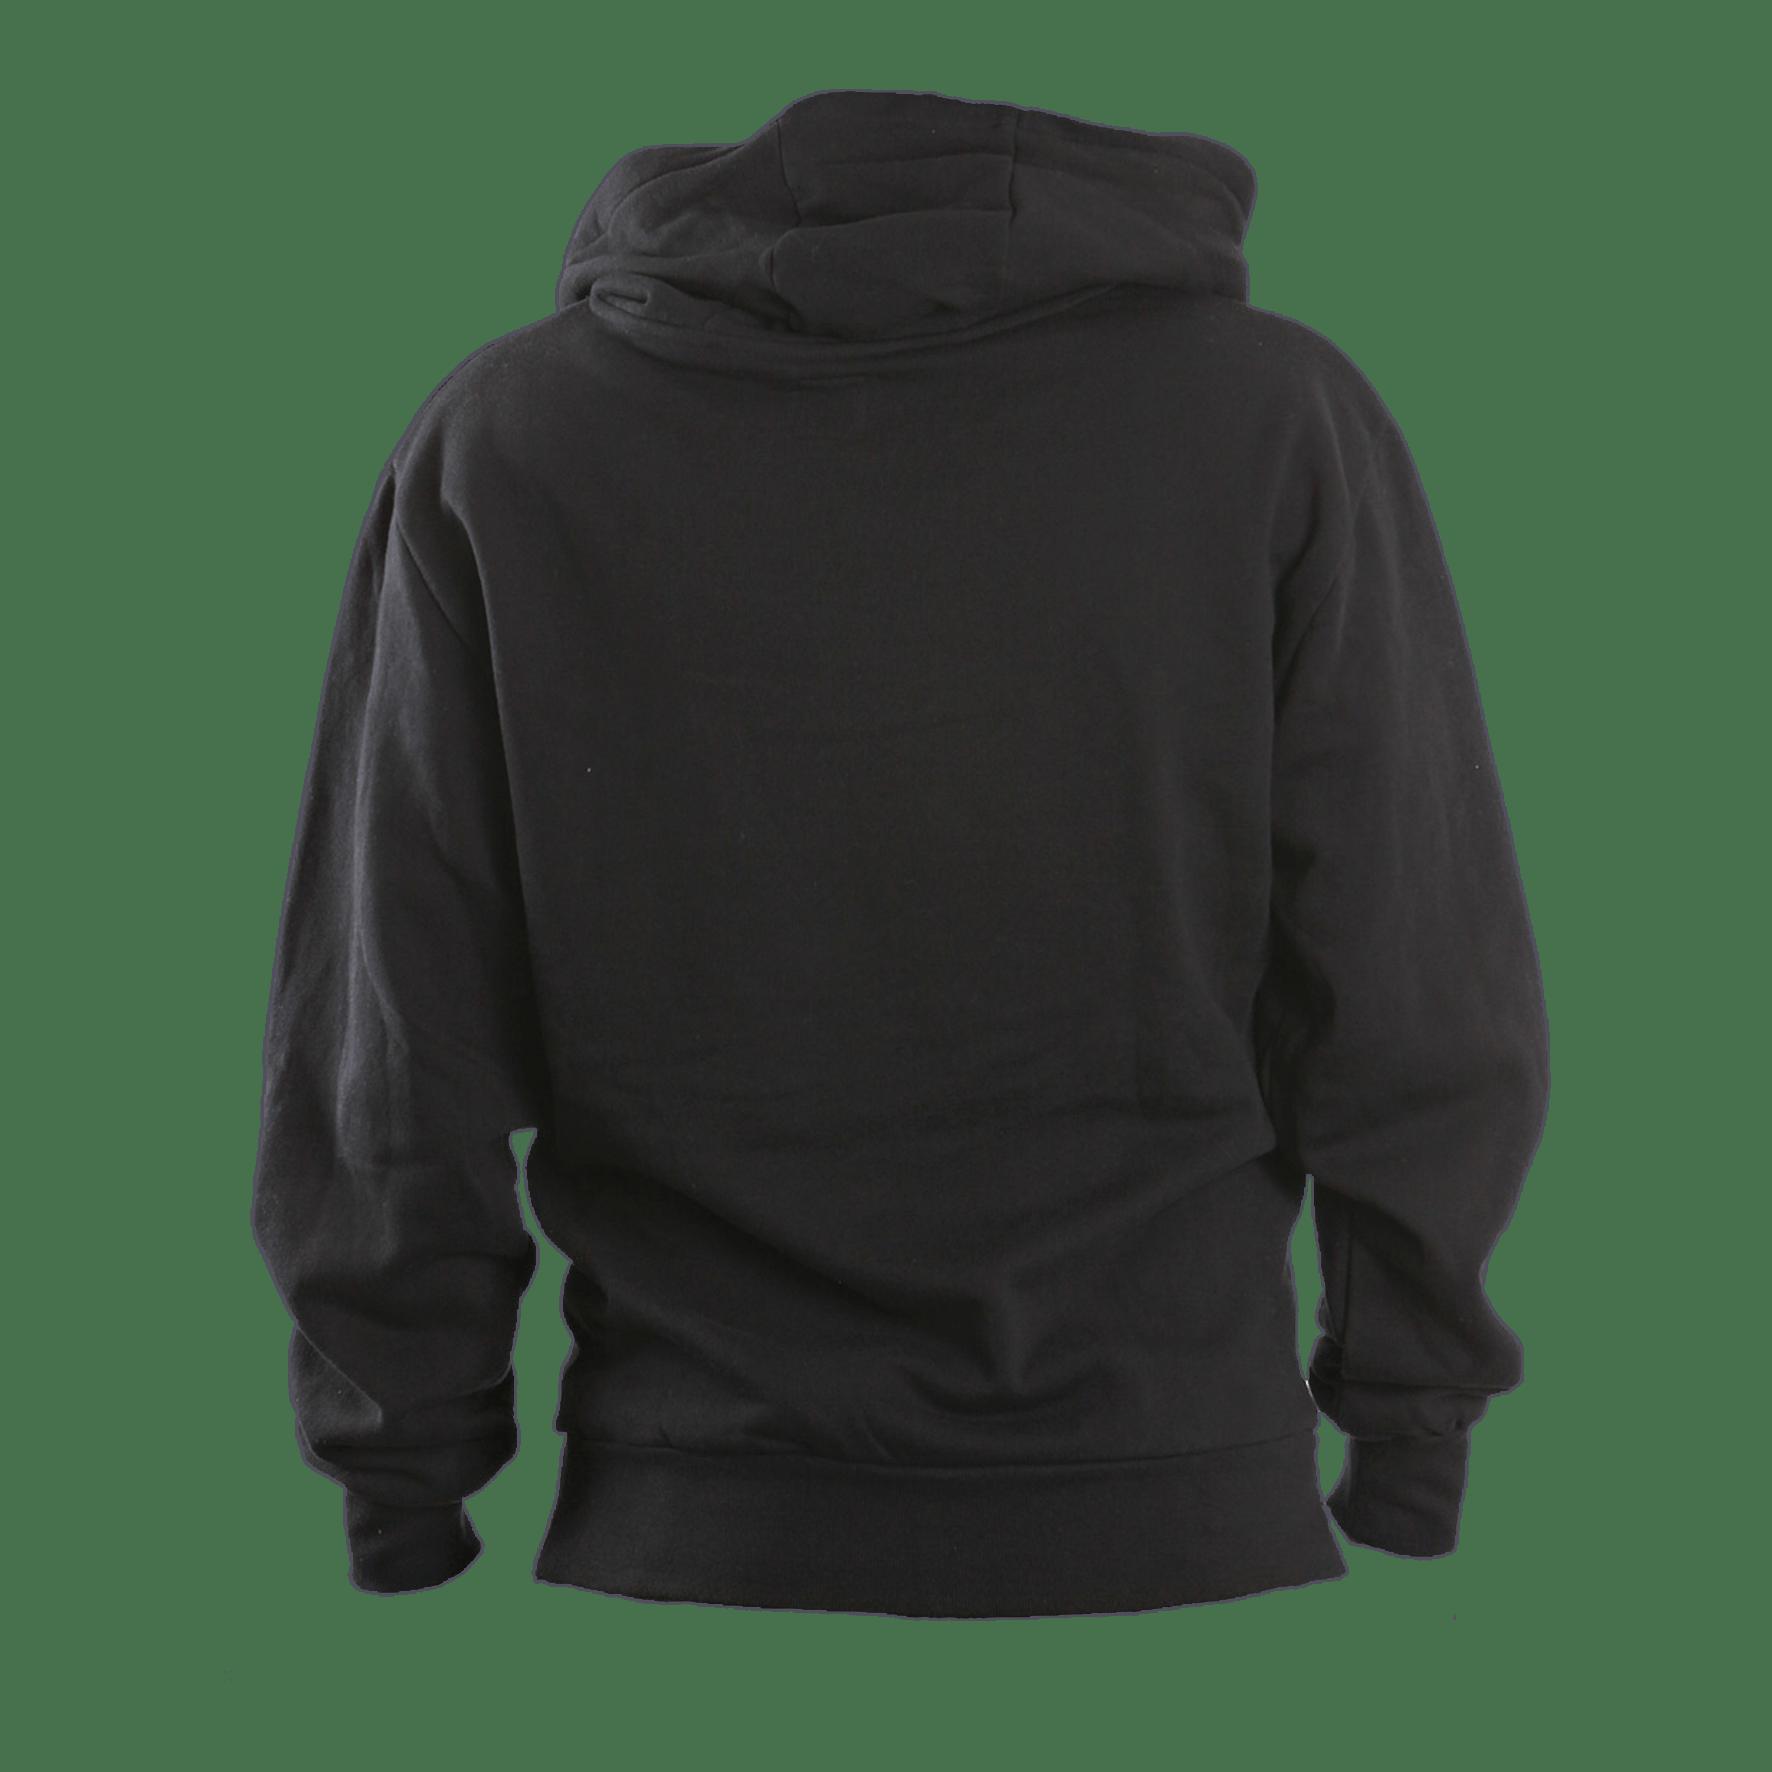 Black png transparent stickpng. Hoodie clipart sweatsuit